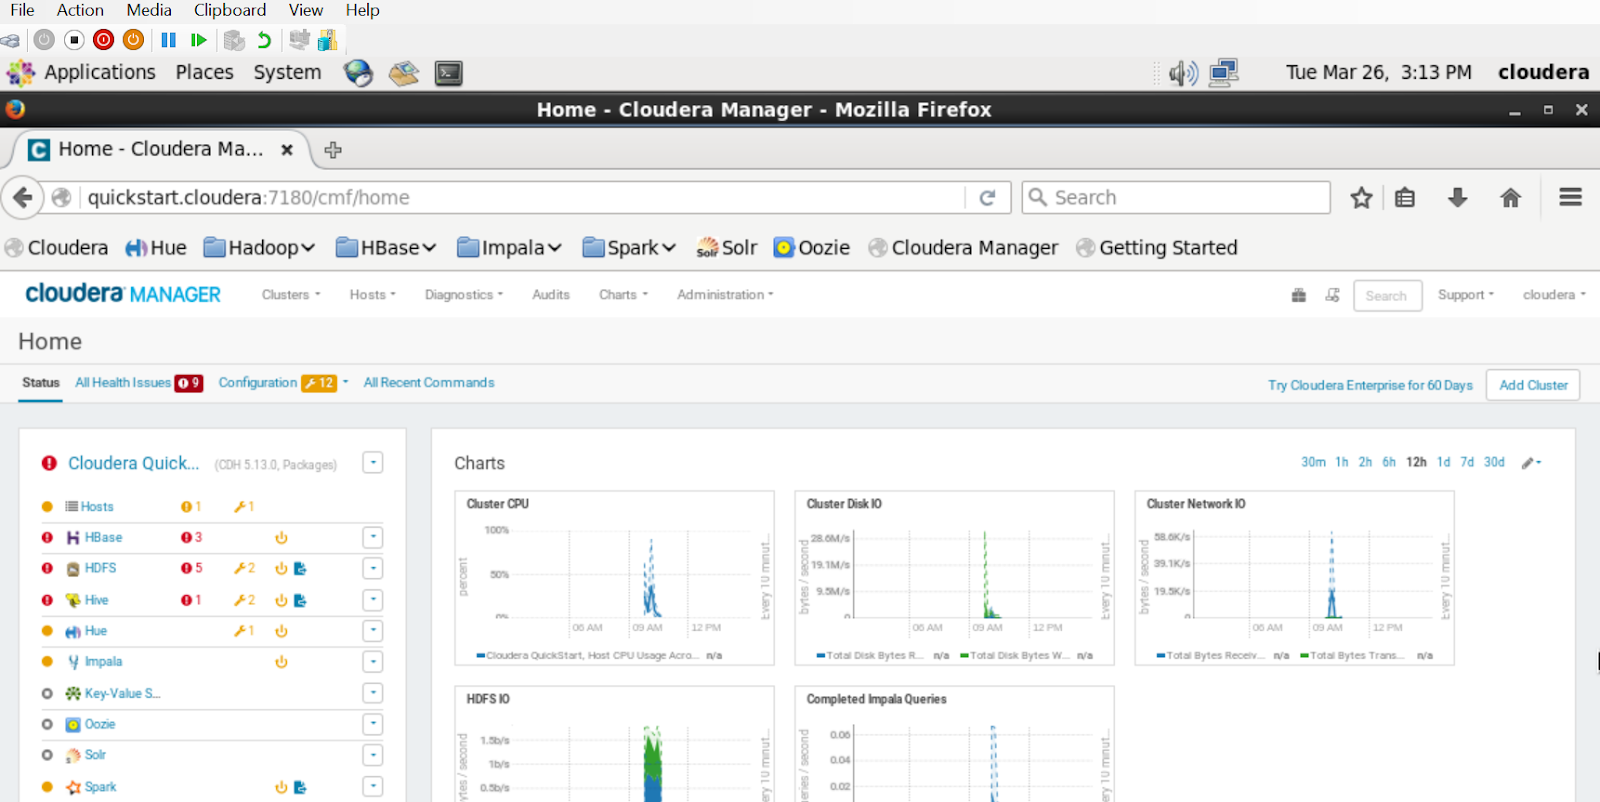 Rajan's View: Cloudera Quick Start VM in Hyper-V